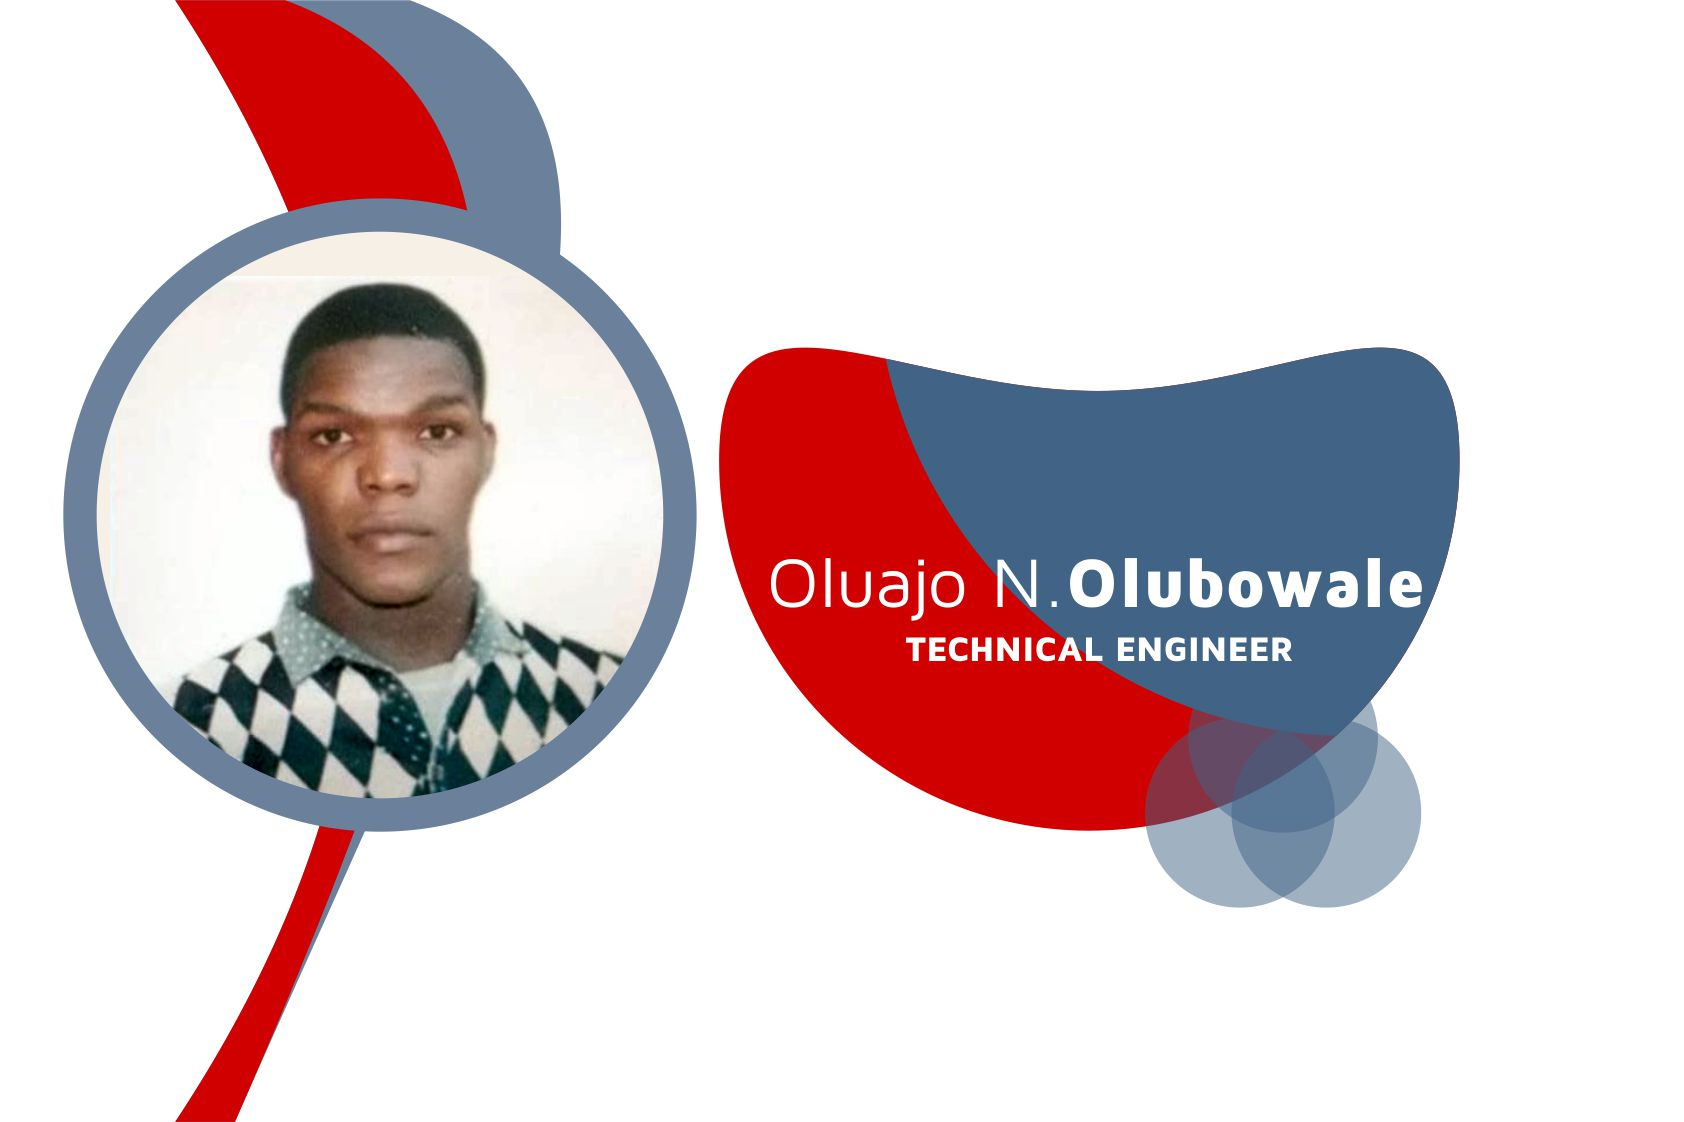 Technical Engineer